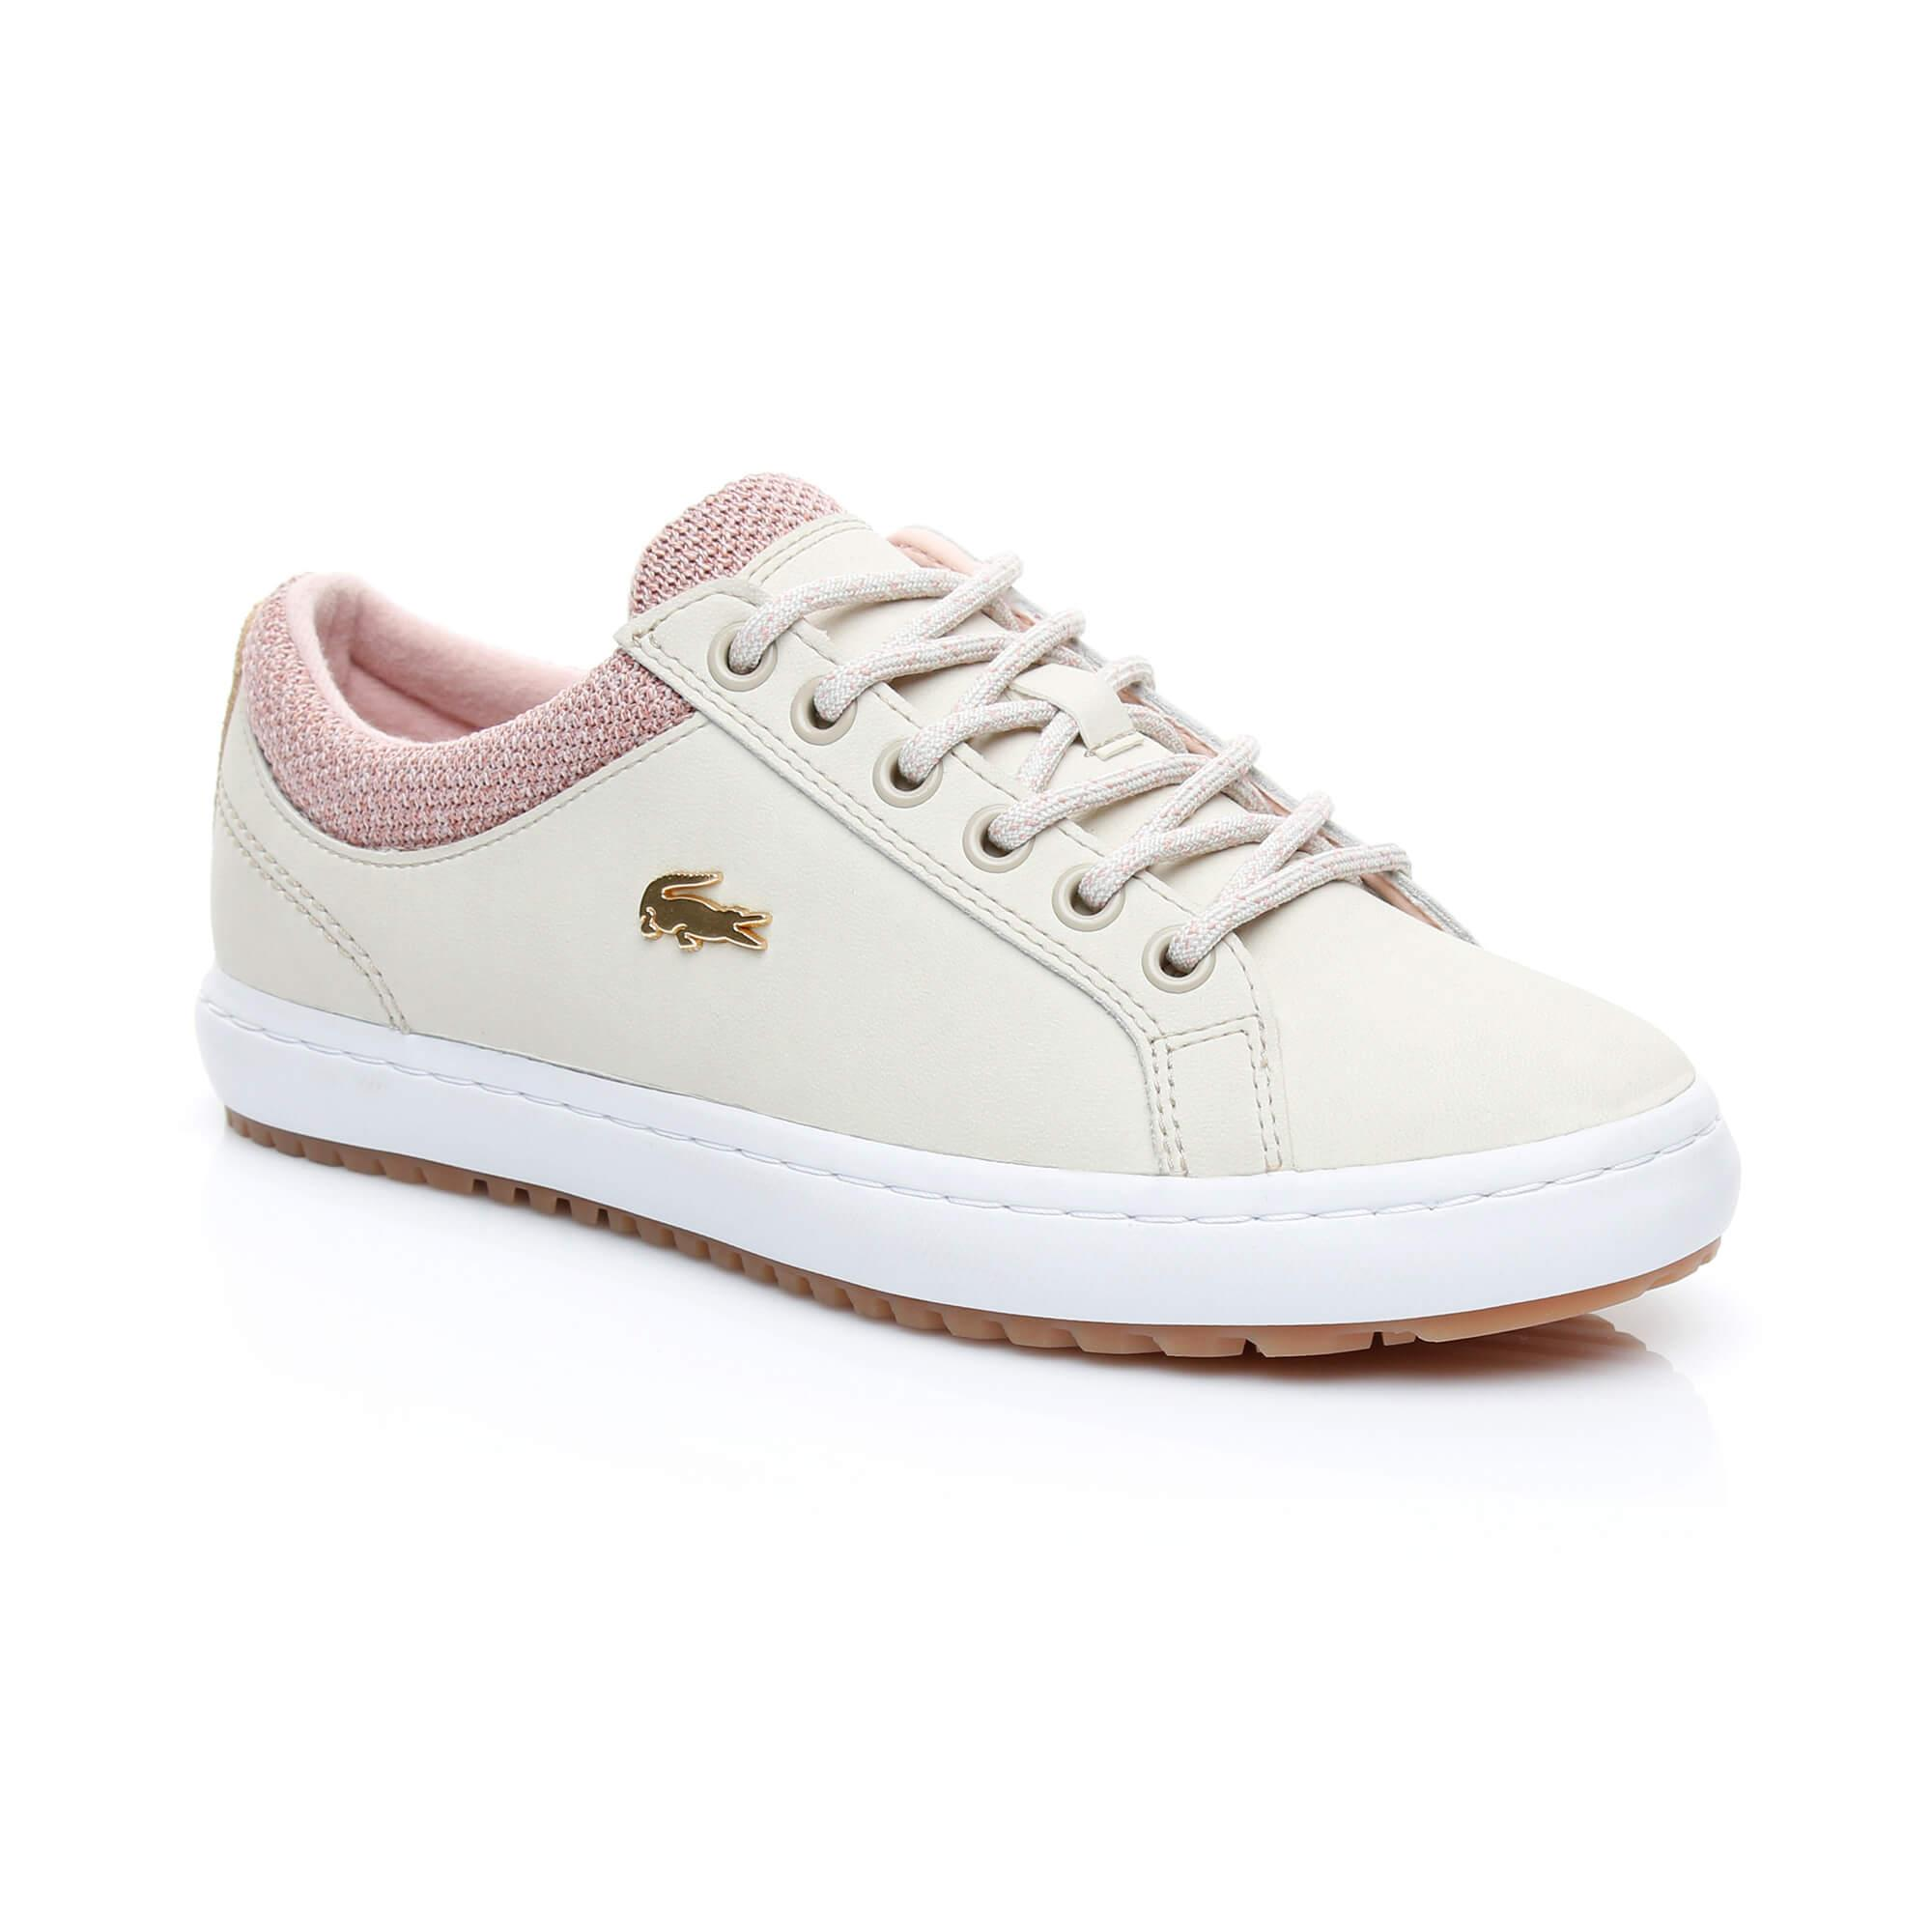 Lacoste Women's Straightset Insulate 3181 Sneaker